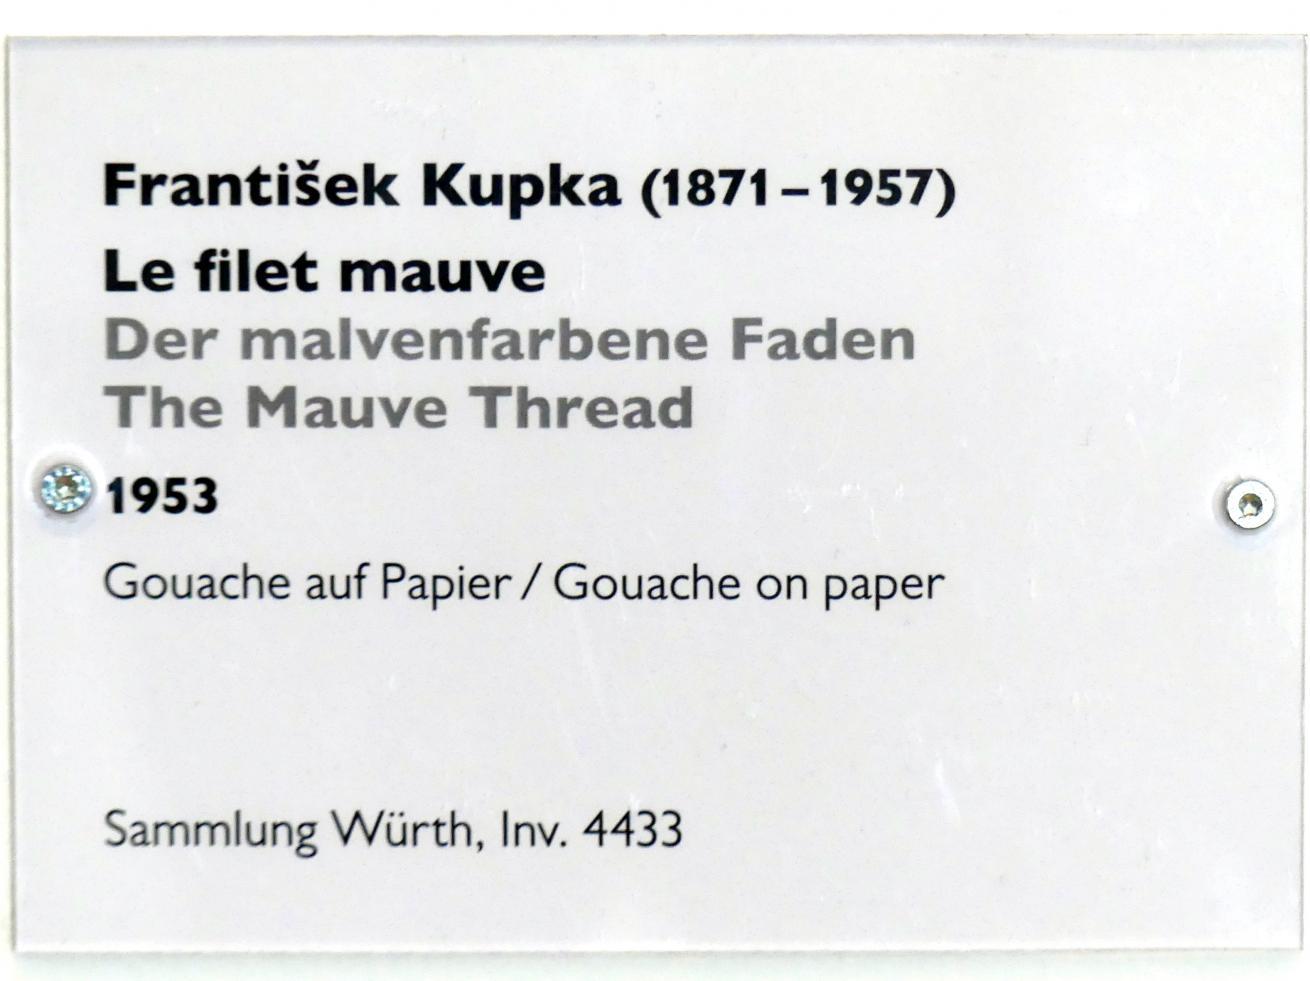 František Kupka: Der malvenfarbene Faden, 1953, Bild 2/2